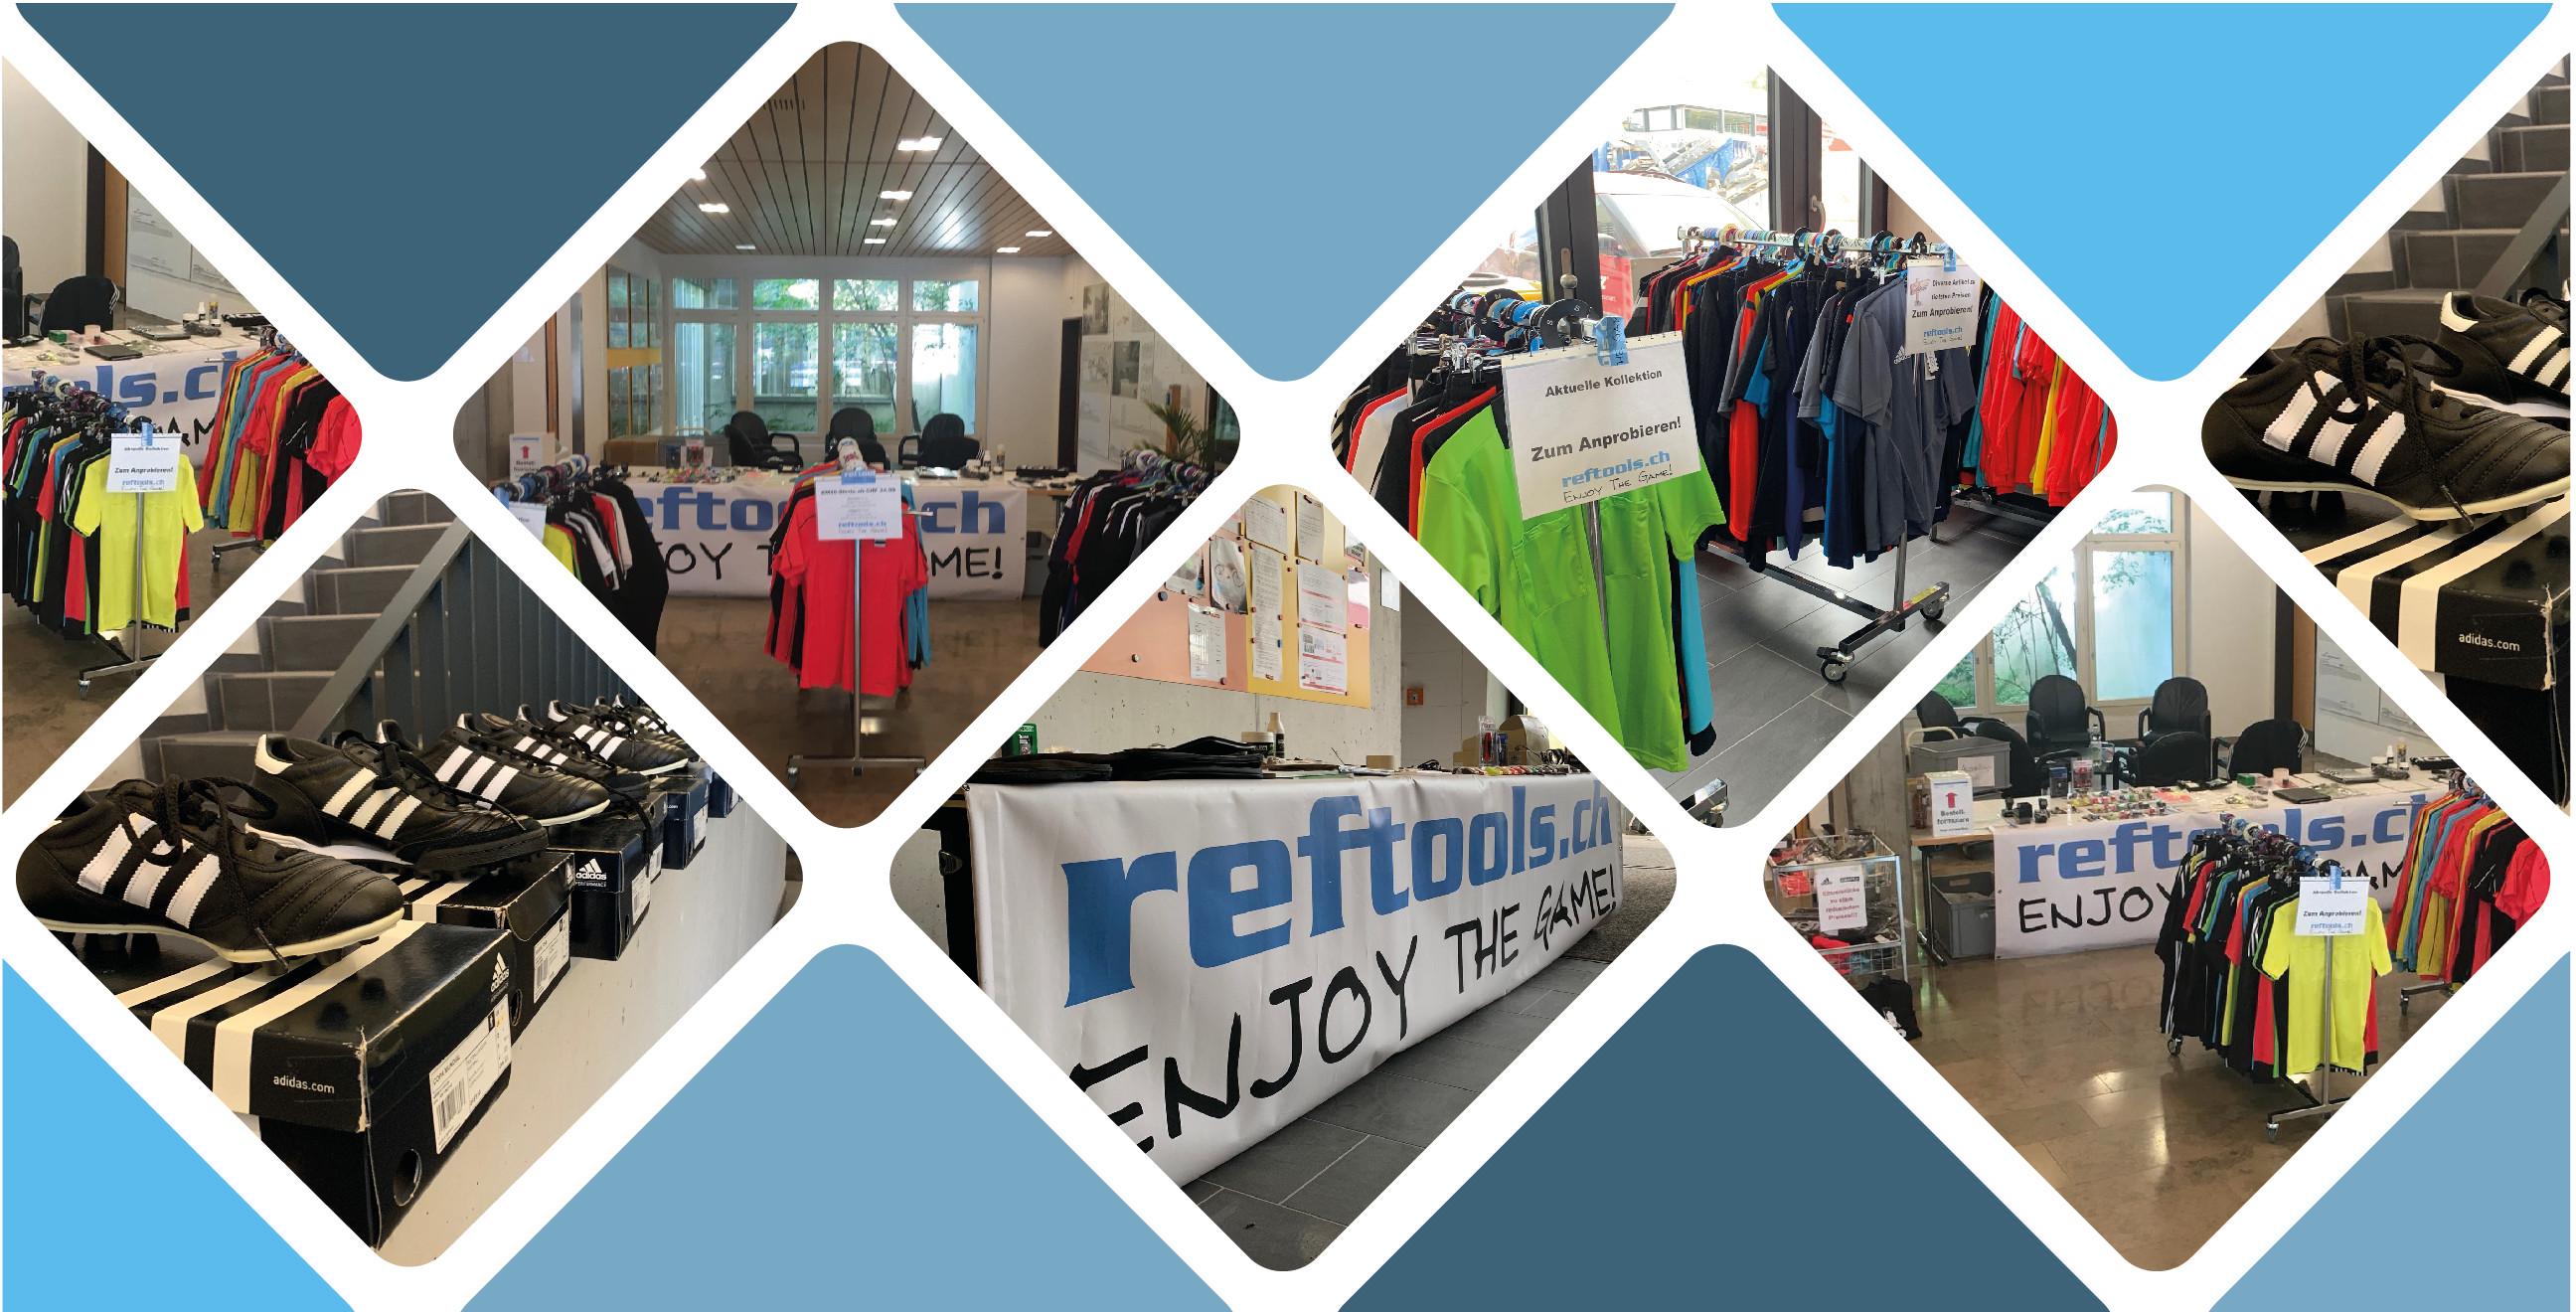 reftools product range